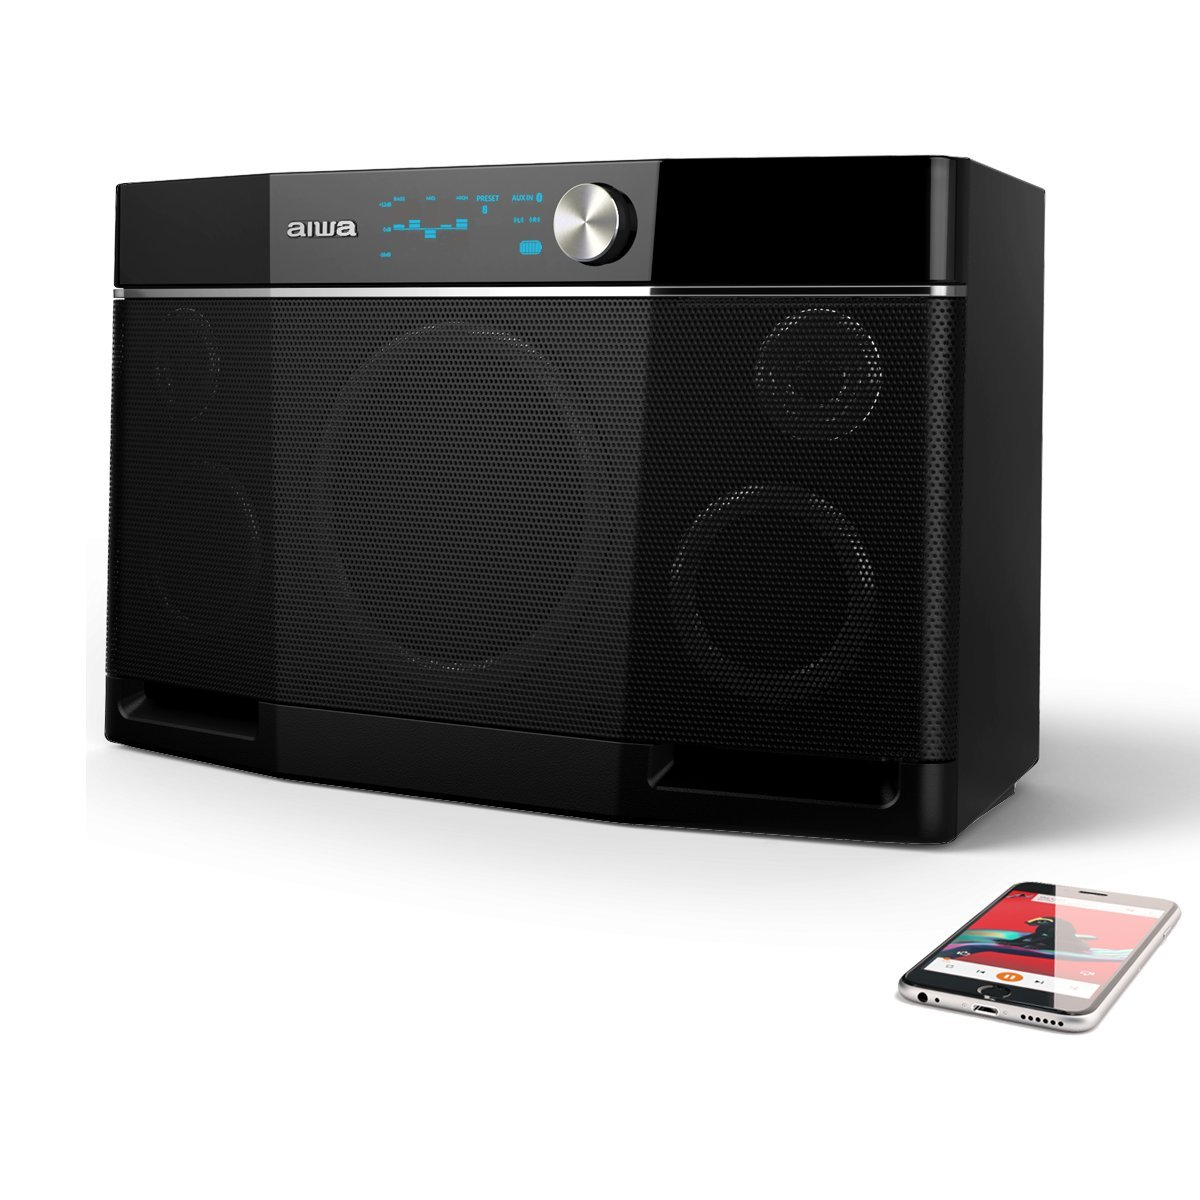 Aiwa Exos-9 Portable Bluetooth Speaker by Aiwa